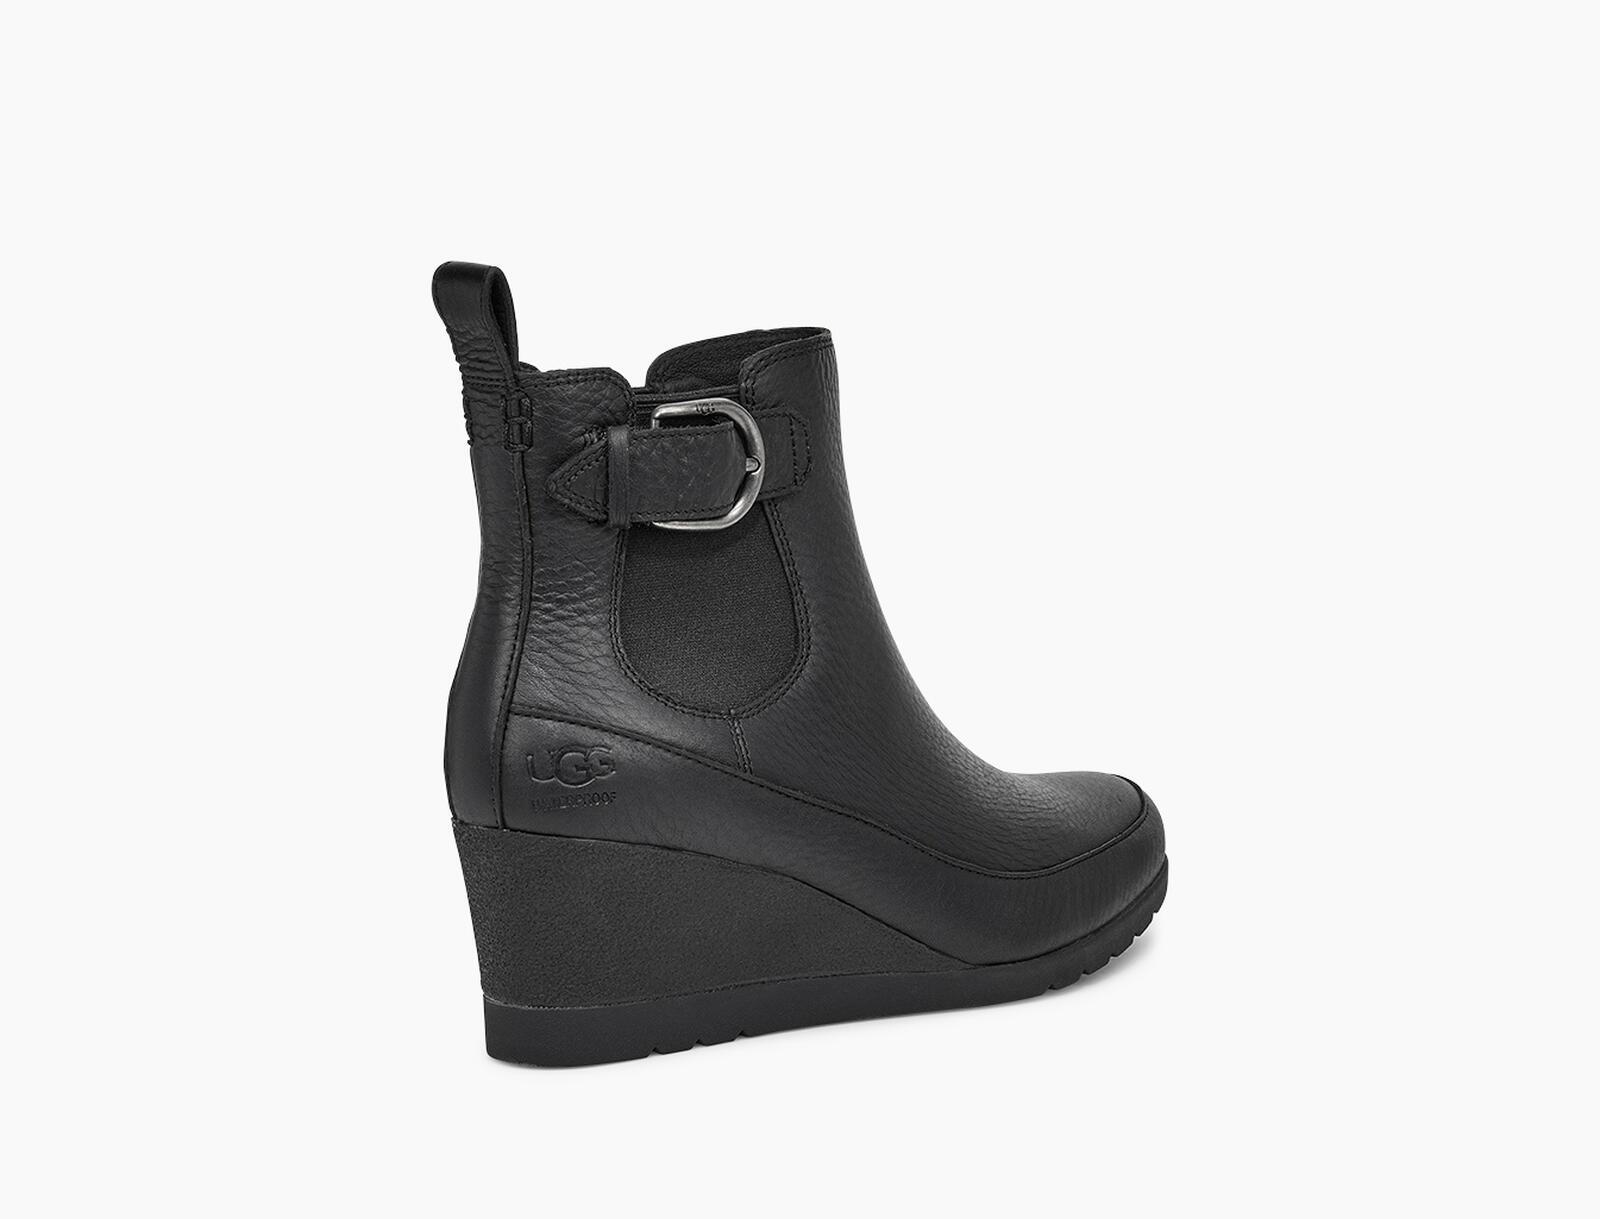 Arleta Warme Boot